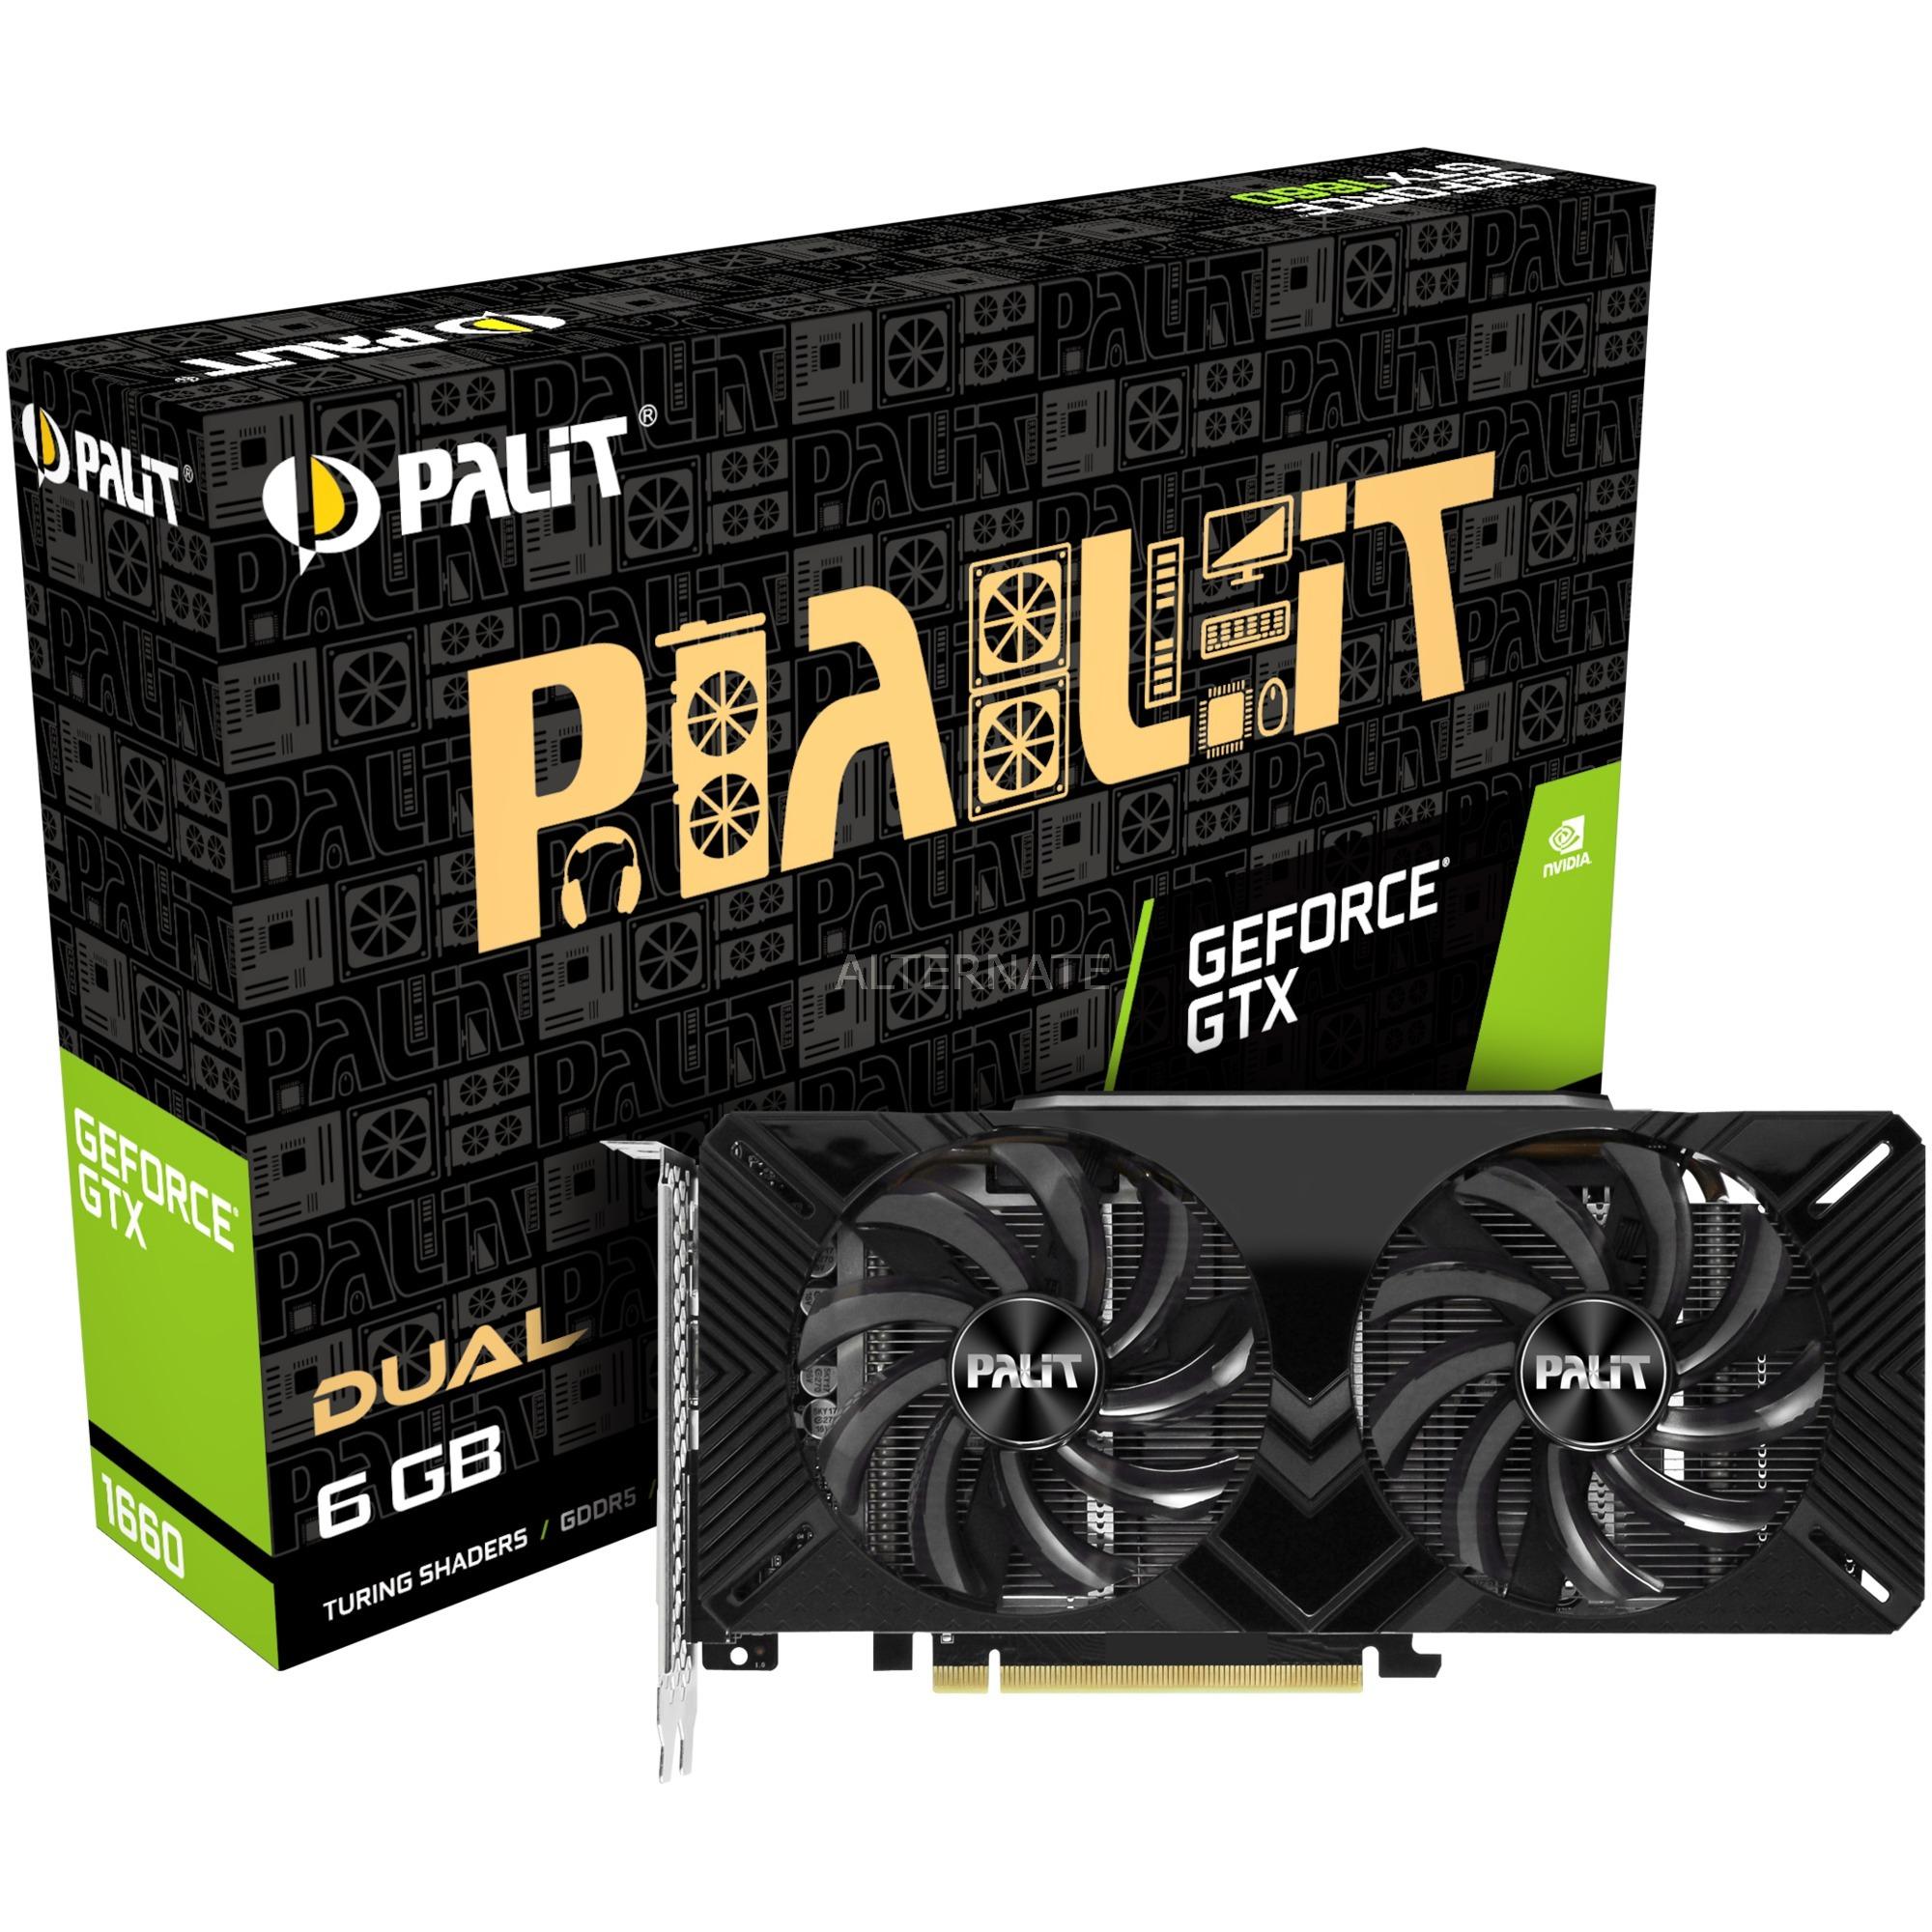 GeForce GTX 1660 Dual 6 GB GDDR5, Tarjeta gráfica